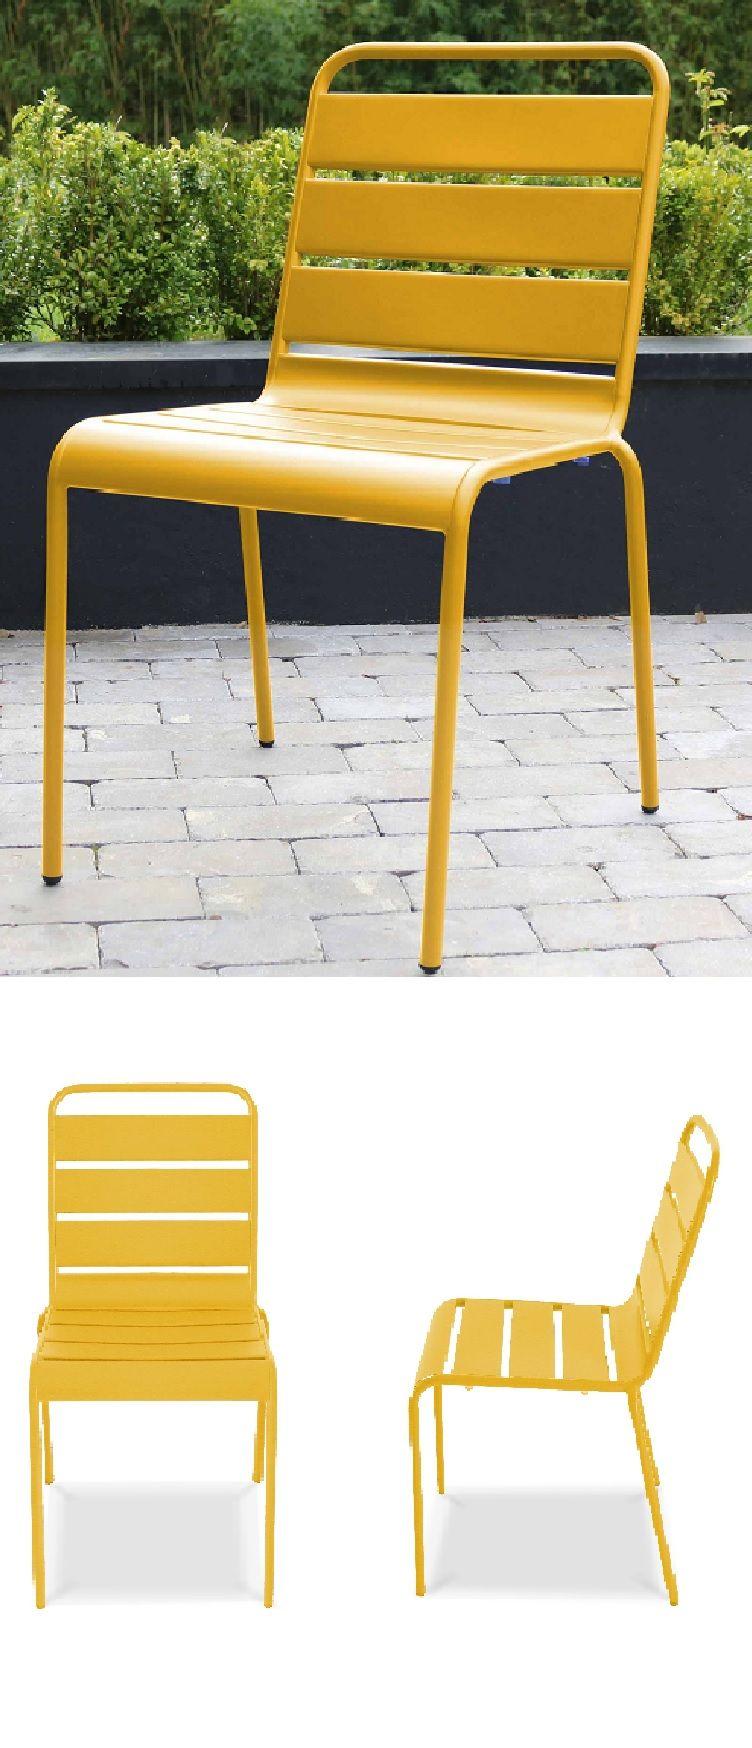 oviala chaise jardin metal